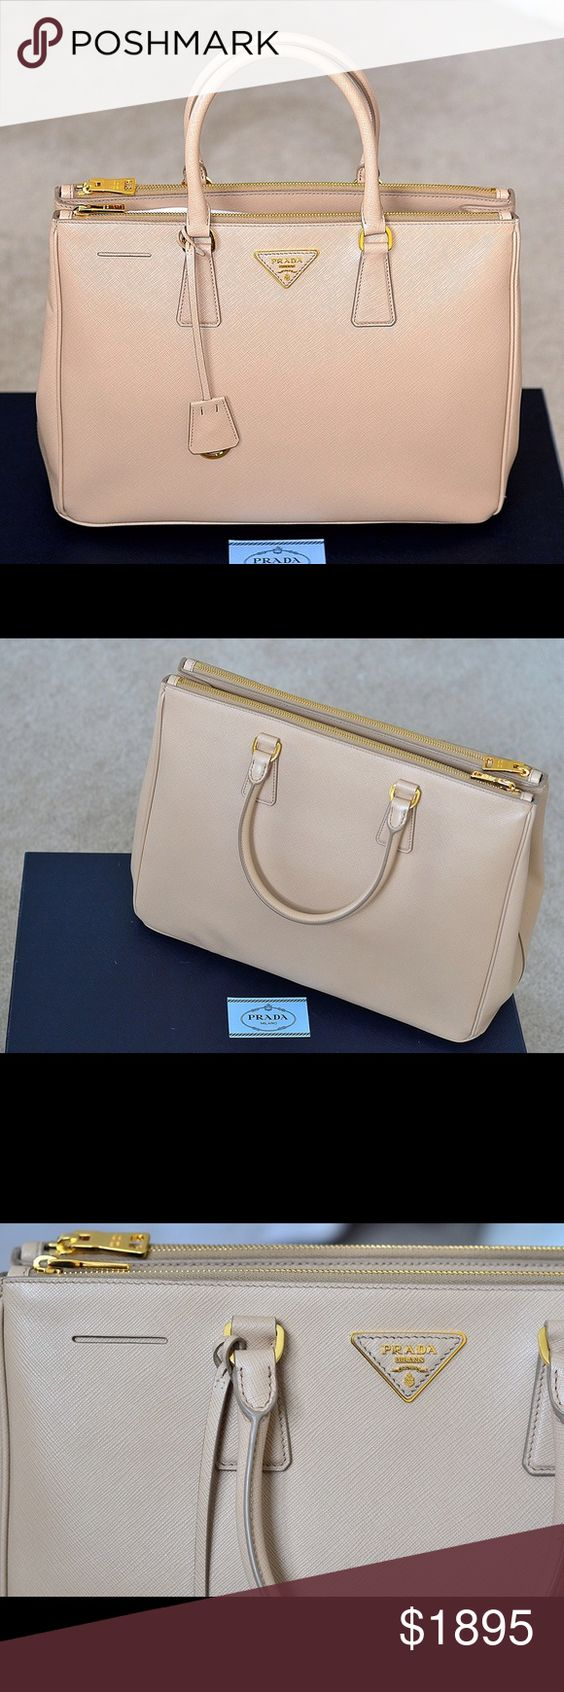 1bc34202d32 ... prada black leather handbags - Prada Saffiano Lux Double Zip ToteNWT    Triangle Logo, ...